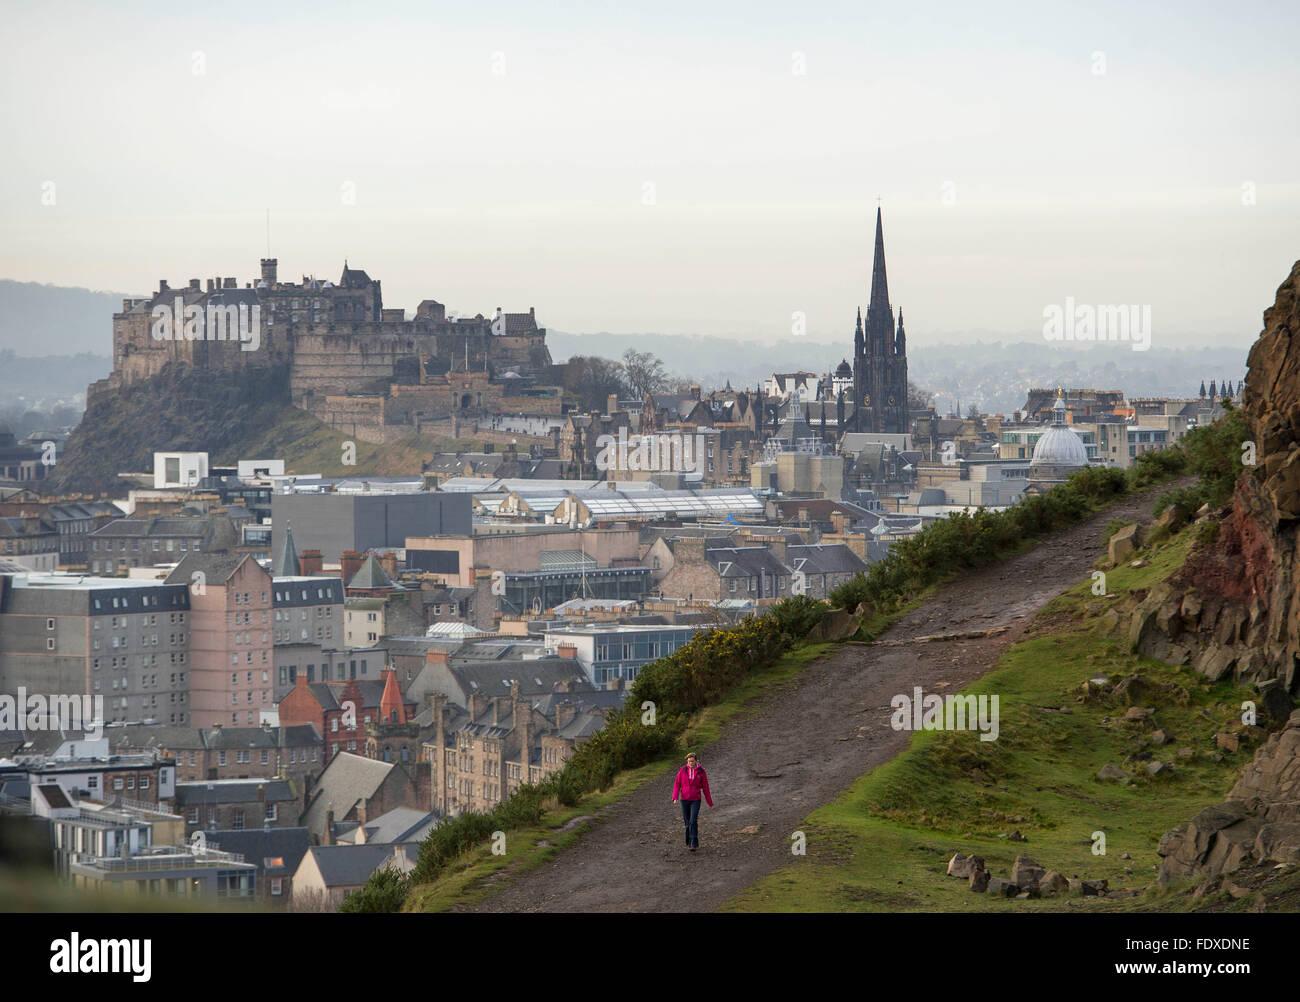 13th December 2015,  Edinburgh, Scotland, UK.  A lone person on the Radical road, Salisbury Crags Holyrood Park. - Stock Image